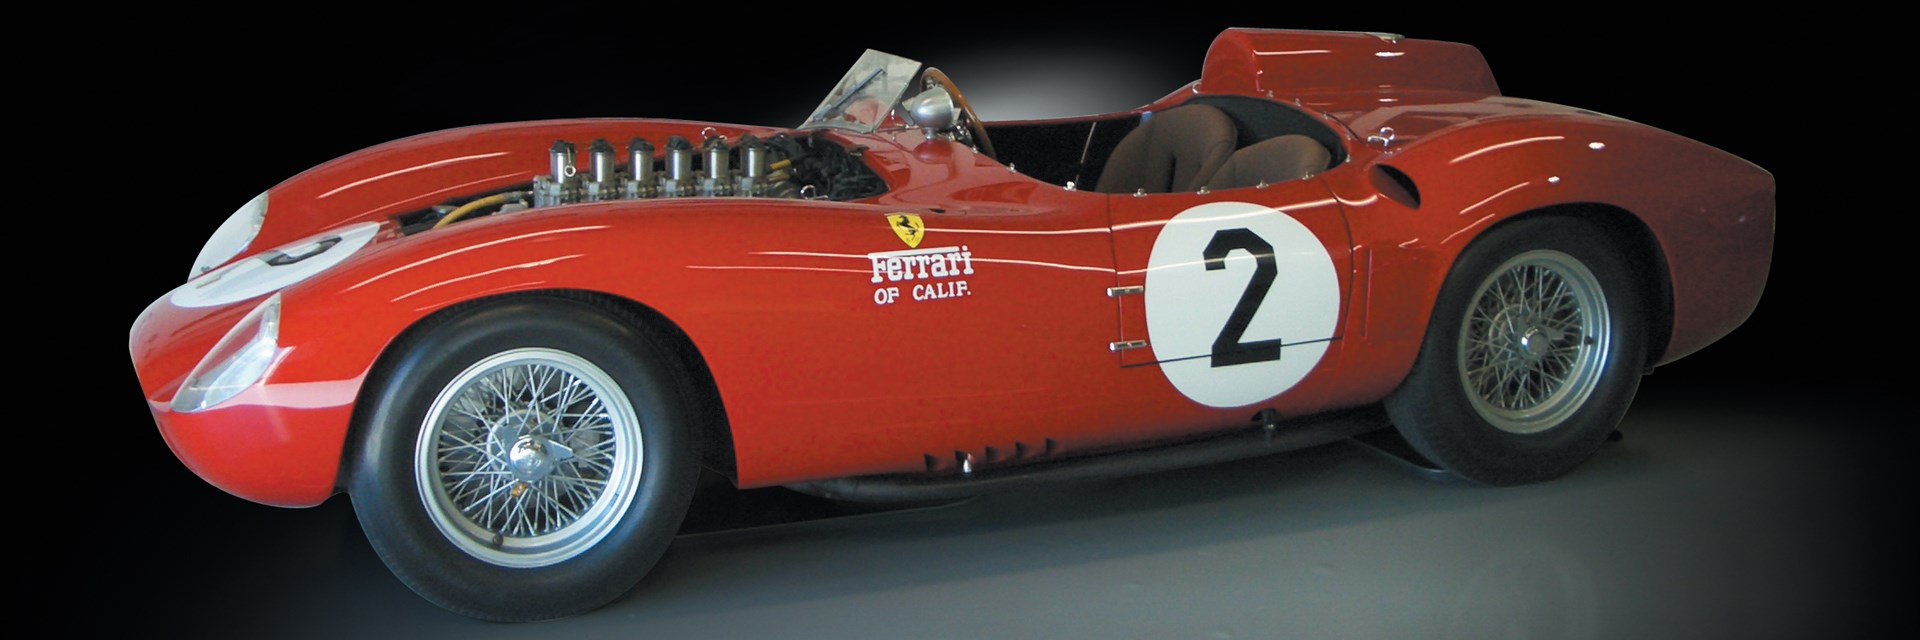 Monterey Sports & Classic Car Auction